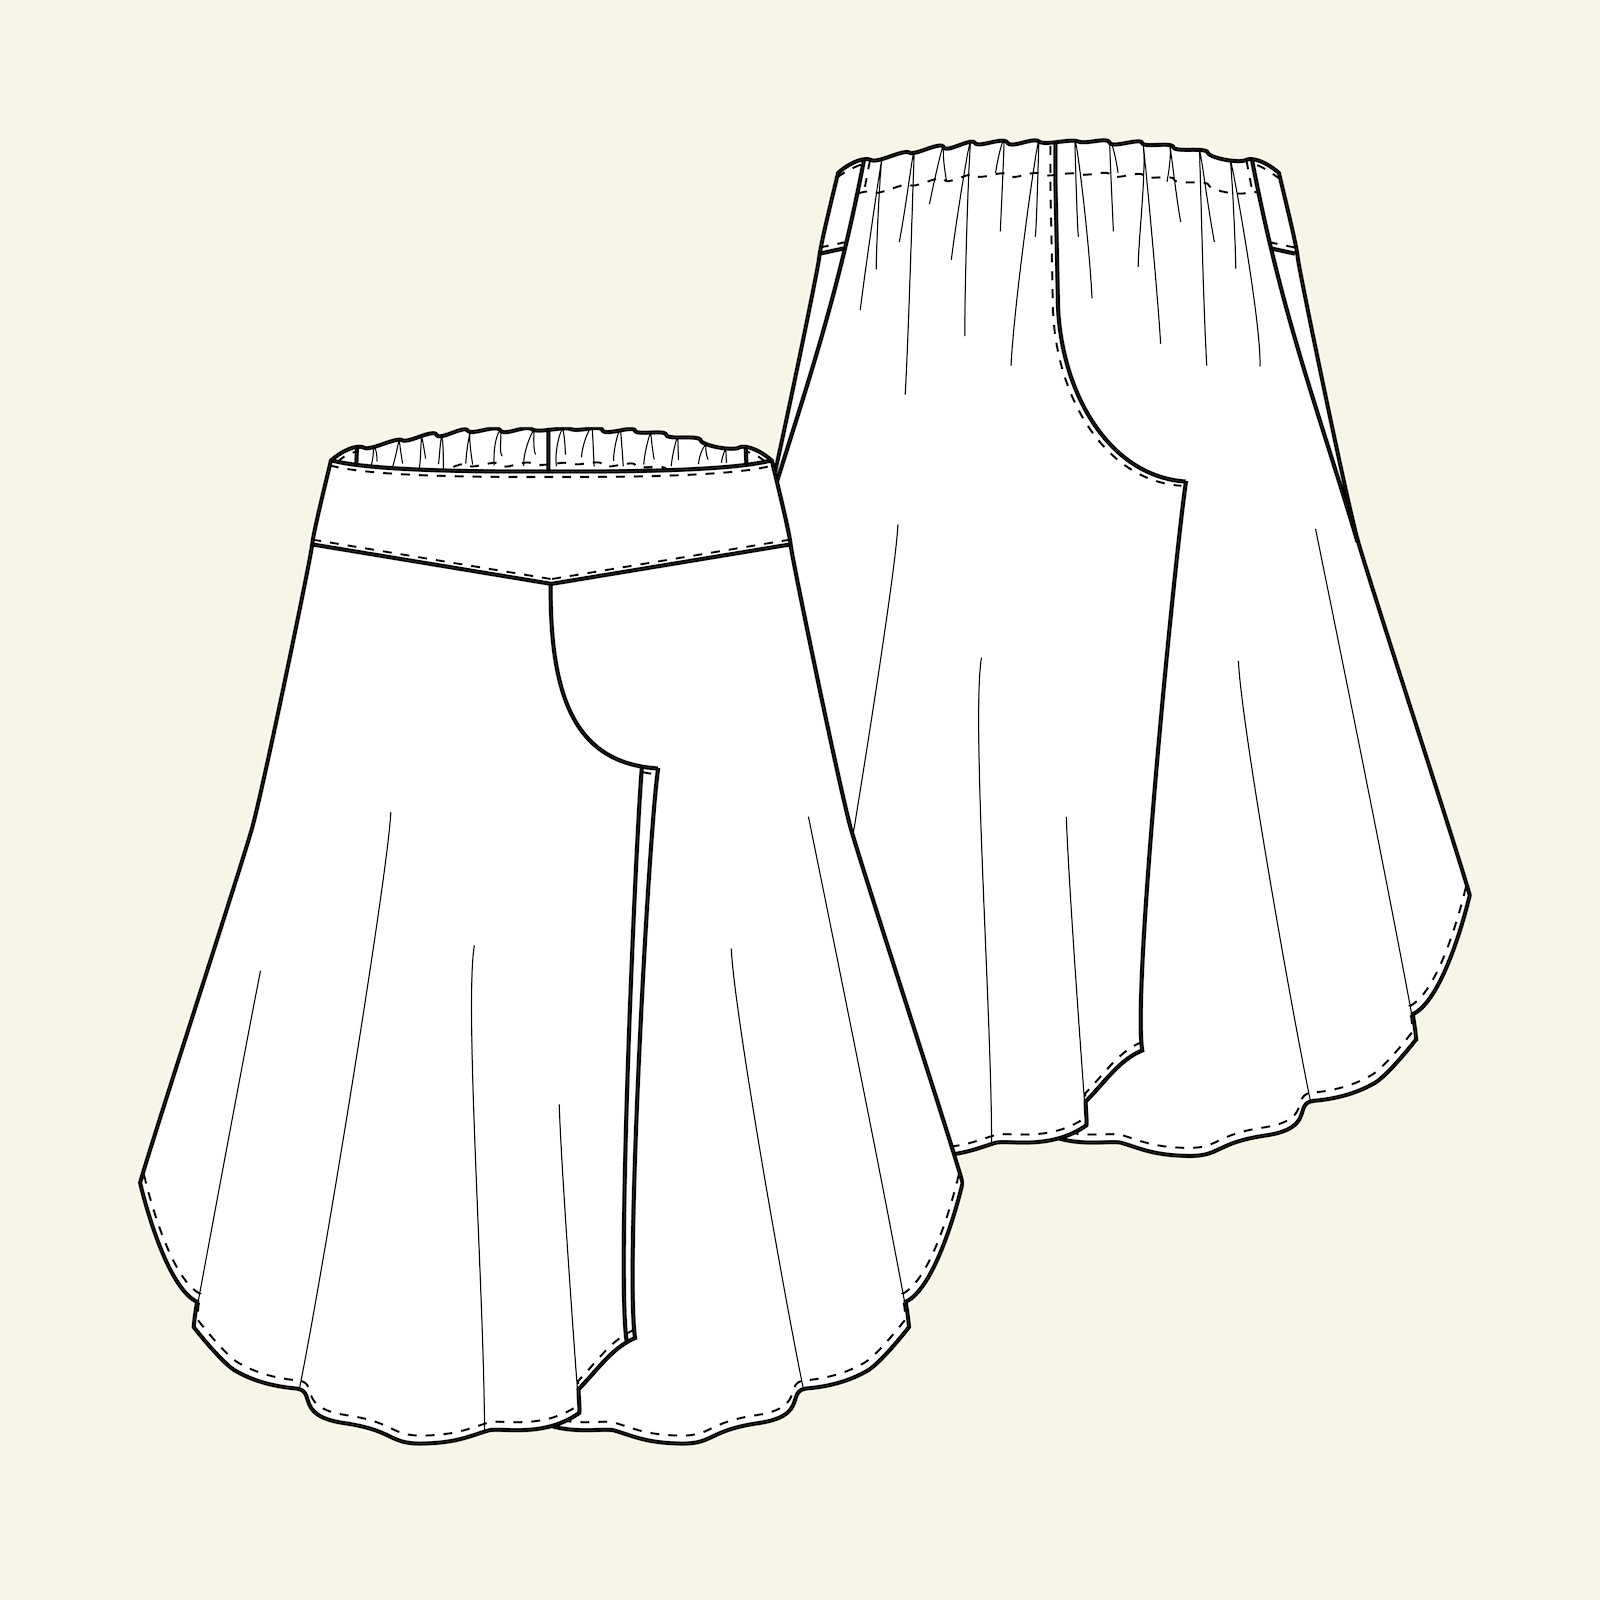 Pants skirt, 46/18 p20053_pack